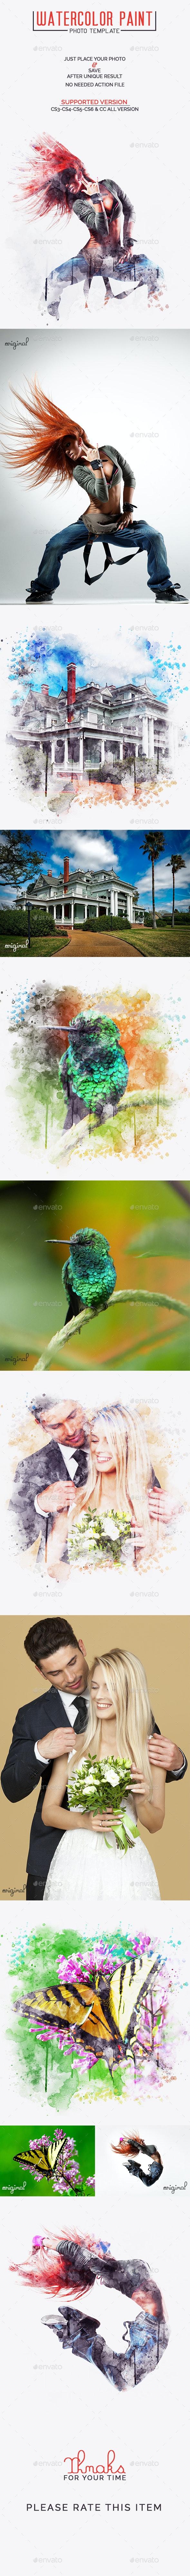 Watercolor Paint Photo Template - Photo Templates Graphics